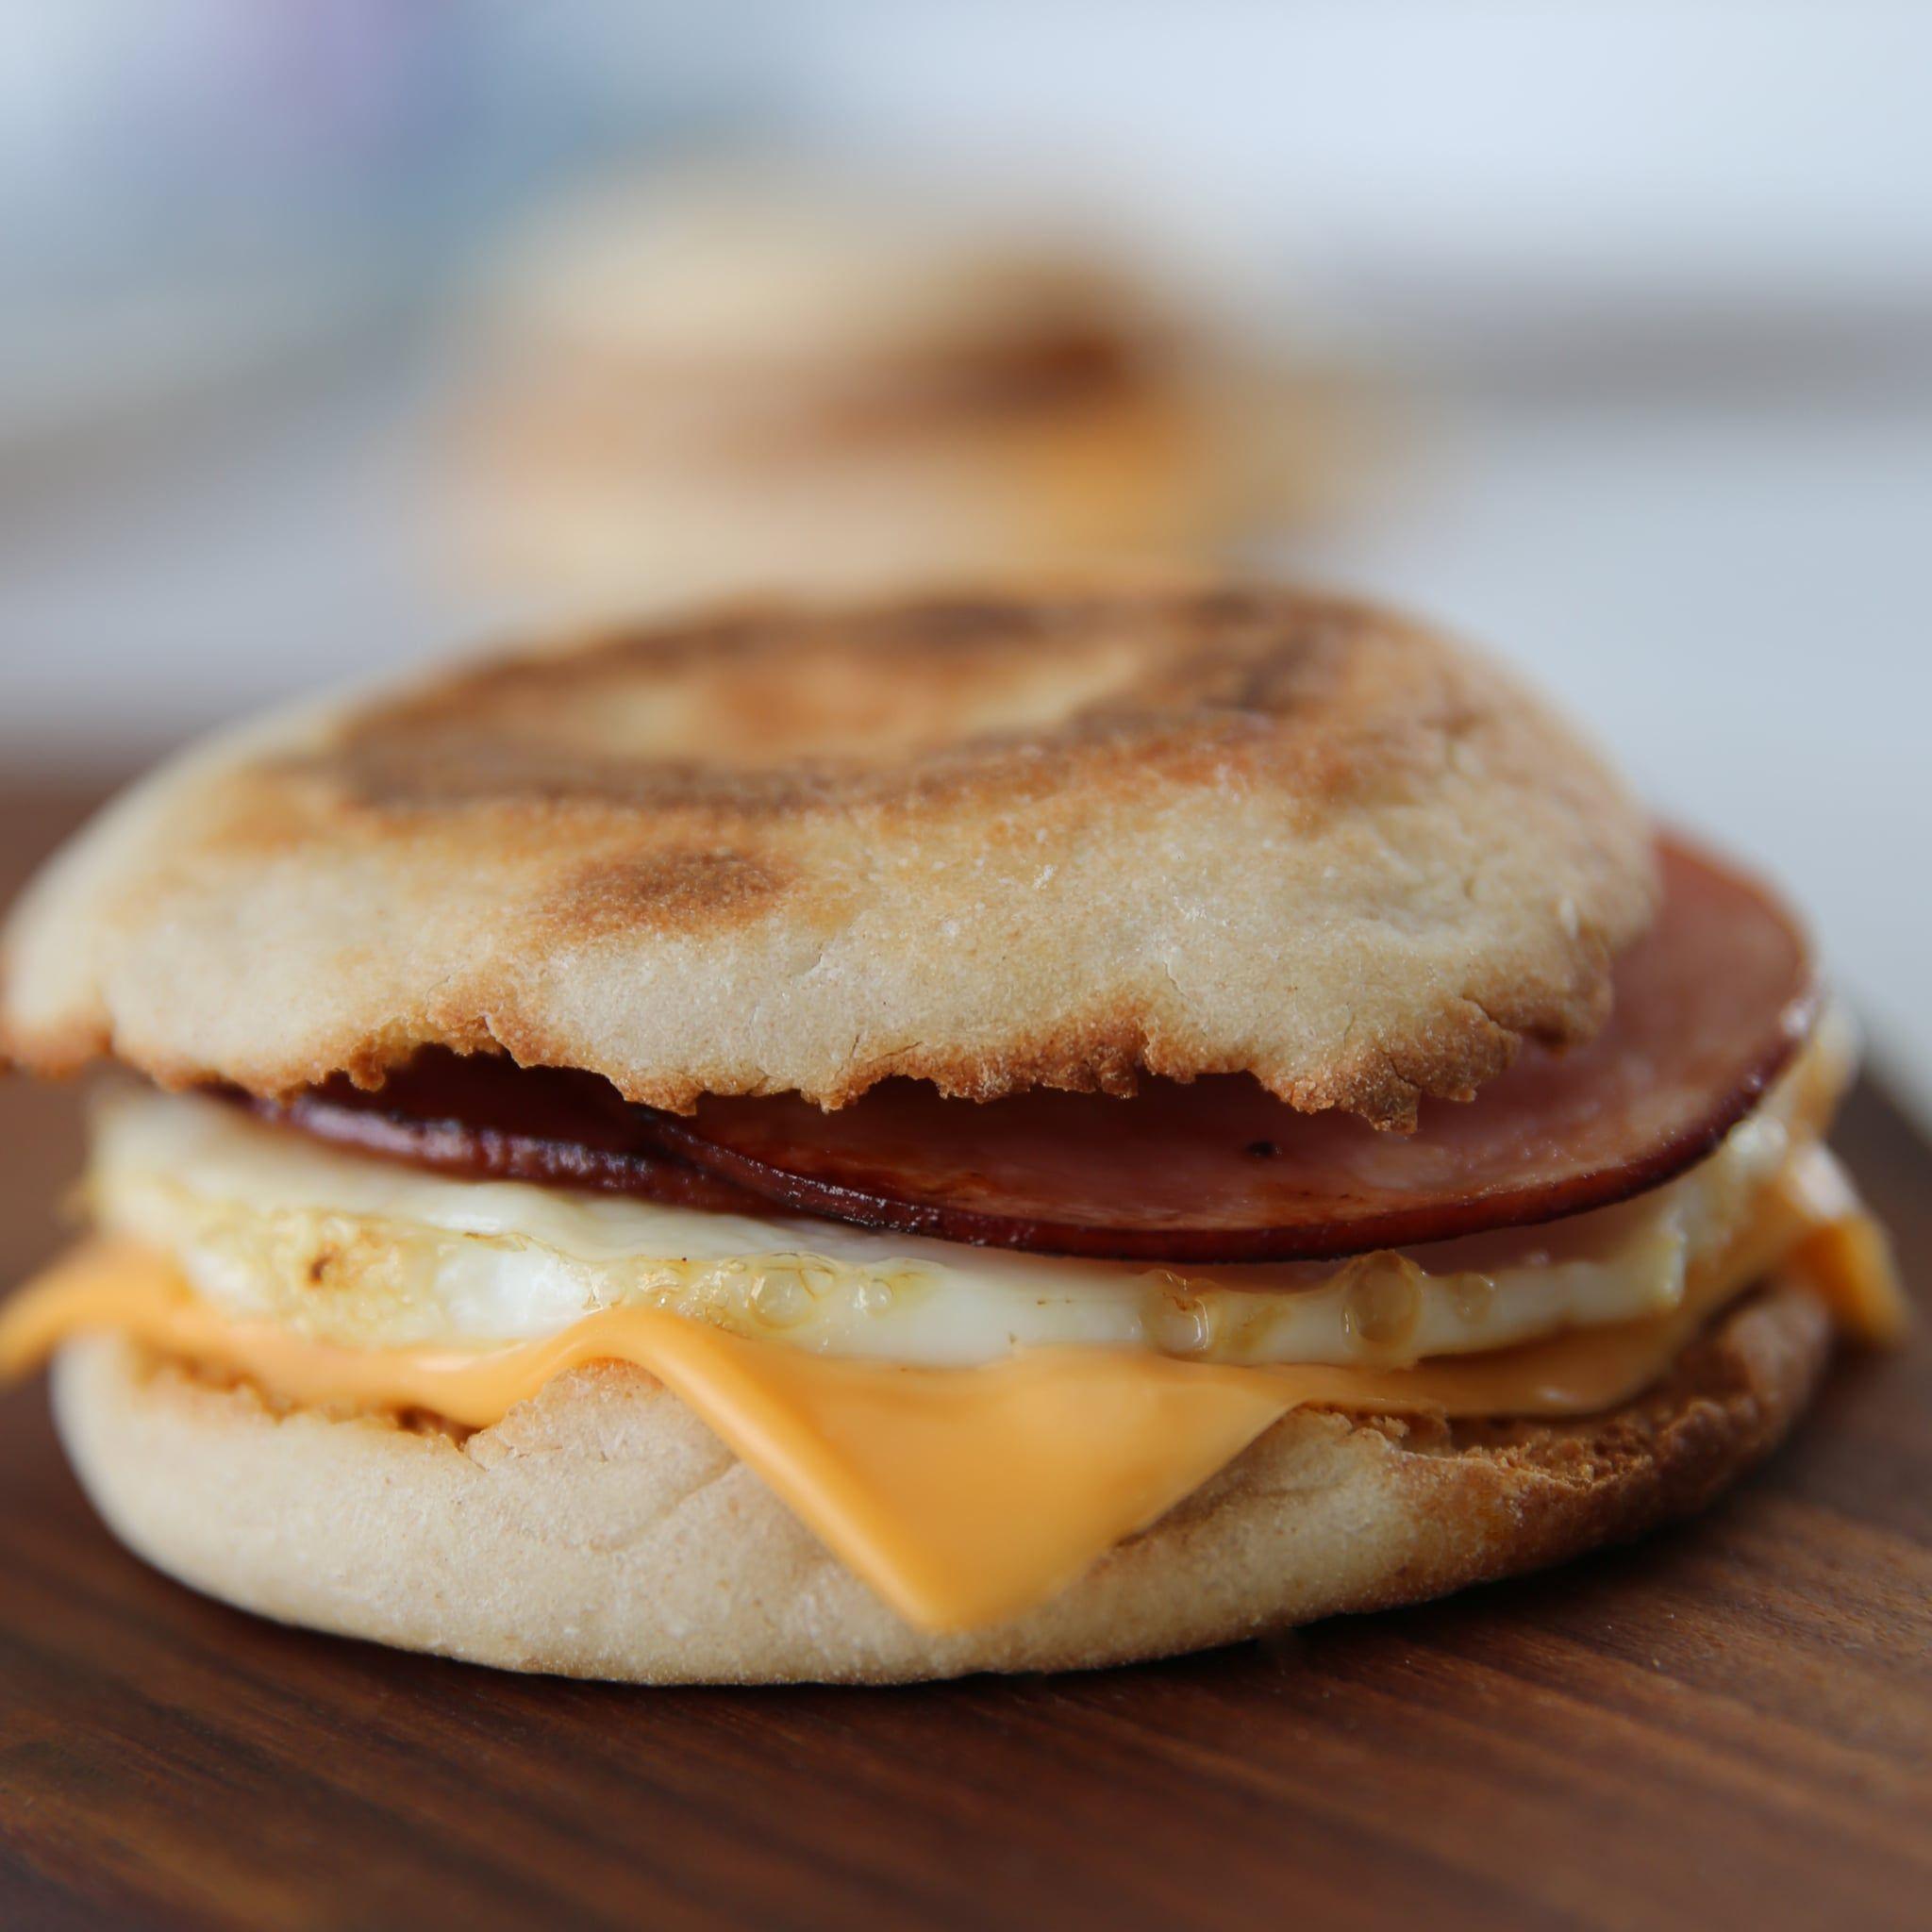 McDonald's Egg McMuffin Mcdonalds egg mcmuffin, Food